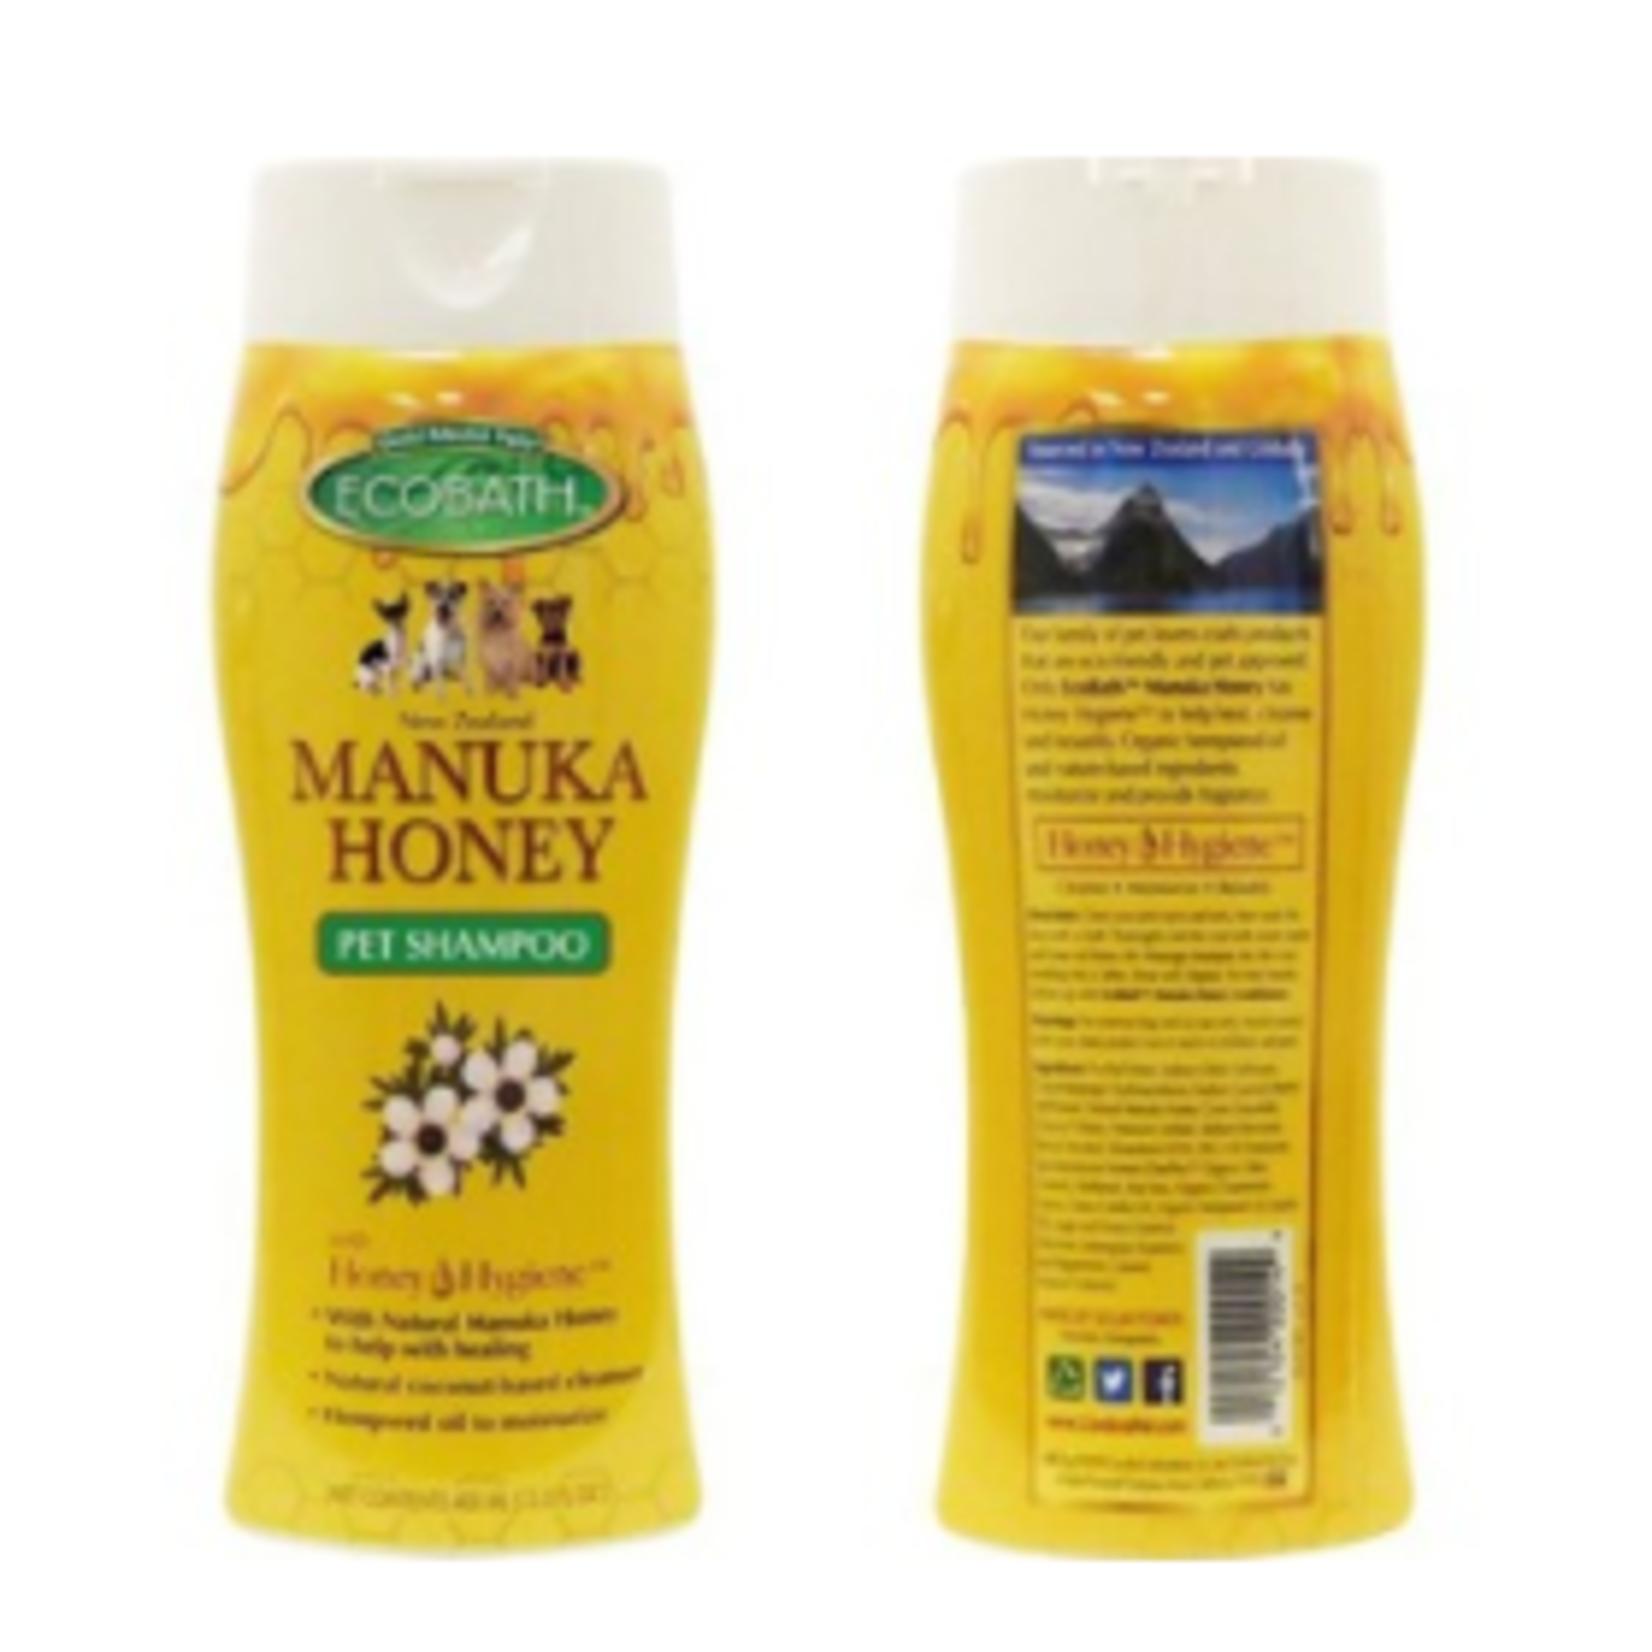 EcoBath - Manuka Honey